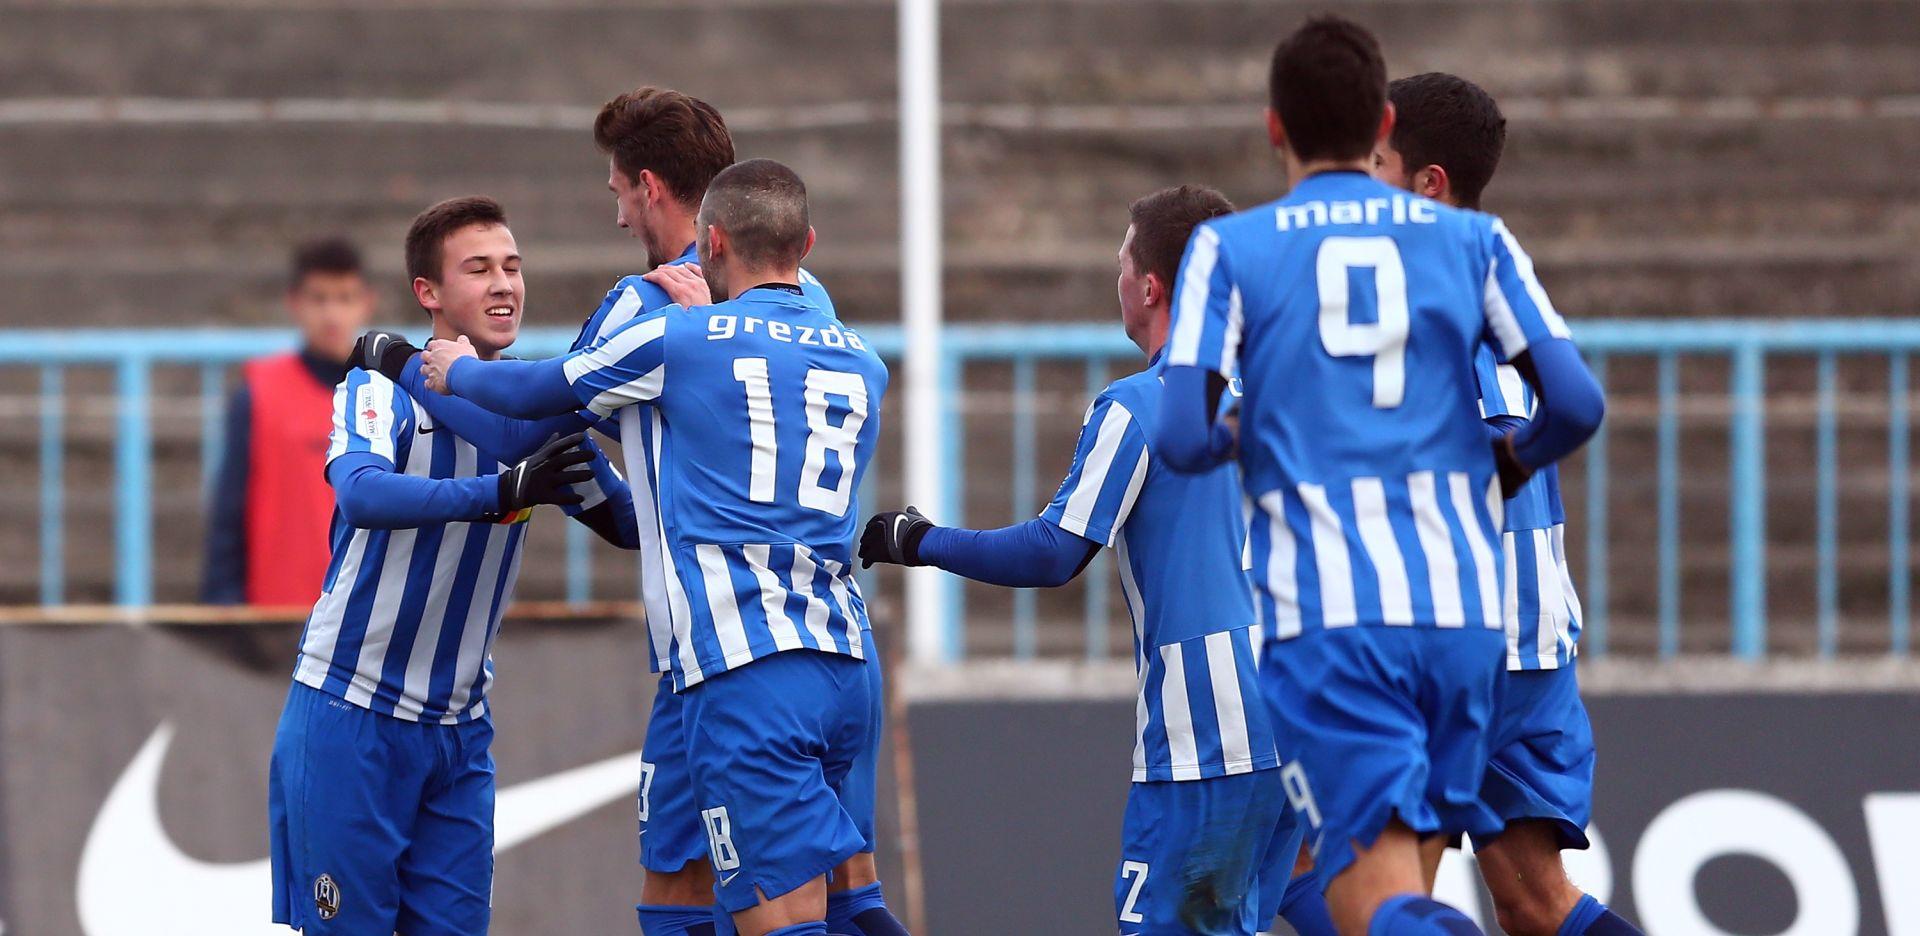 KOPRIVNICA Lokomotiva svladala Slaven, došli na bod zaostatka četvrtom Splitu